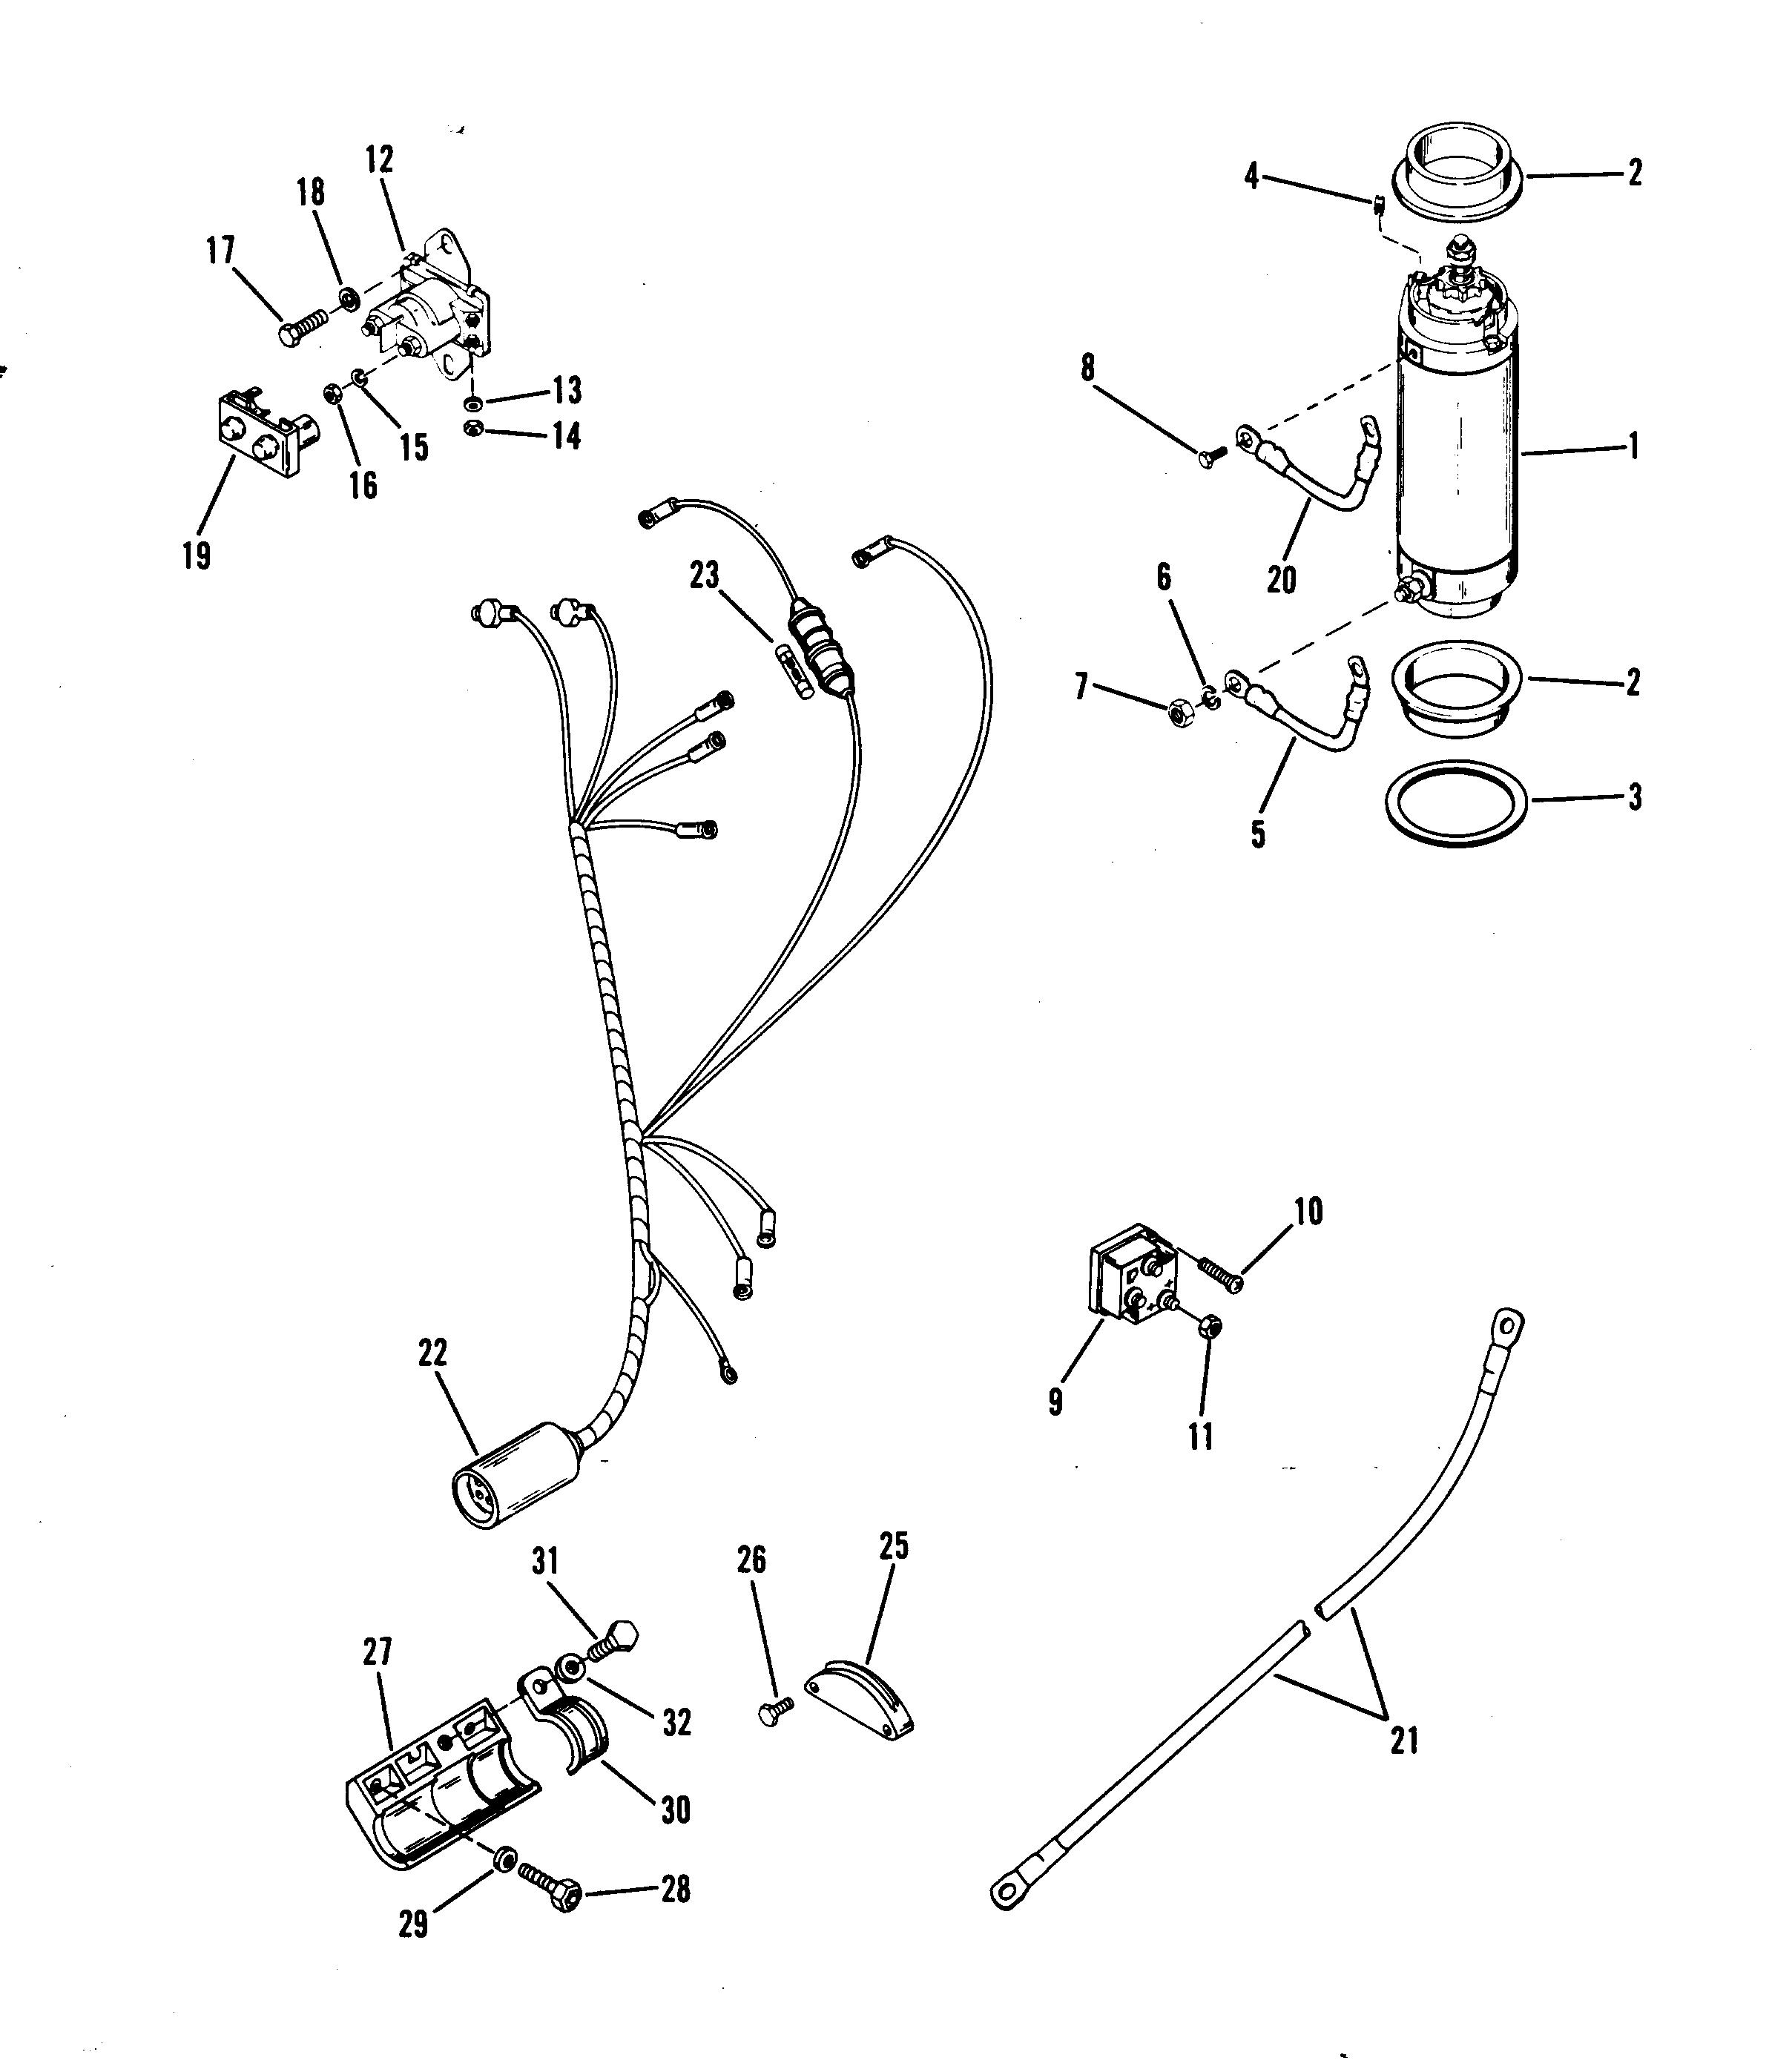 1985 mariner 75 hp wiring diagram